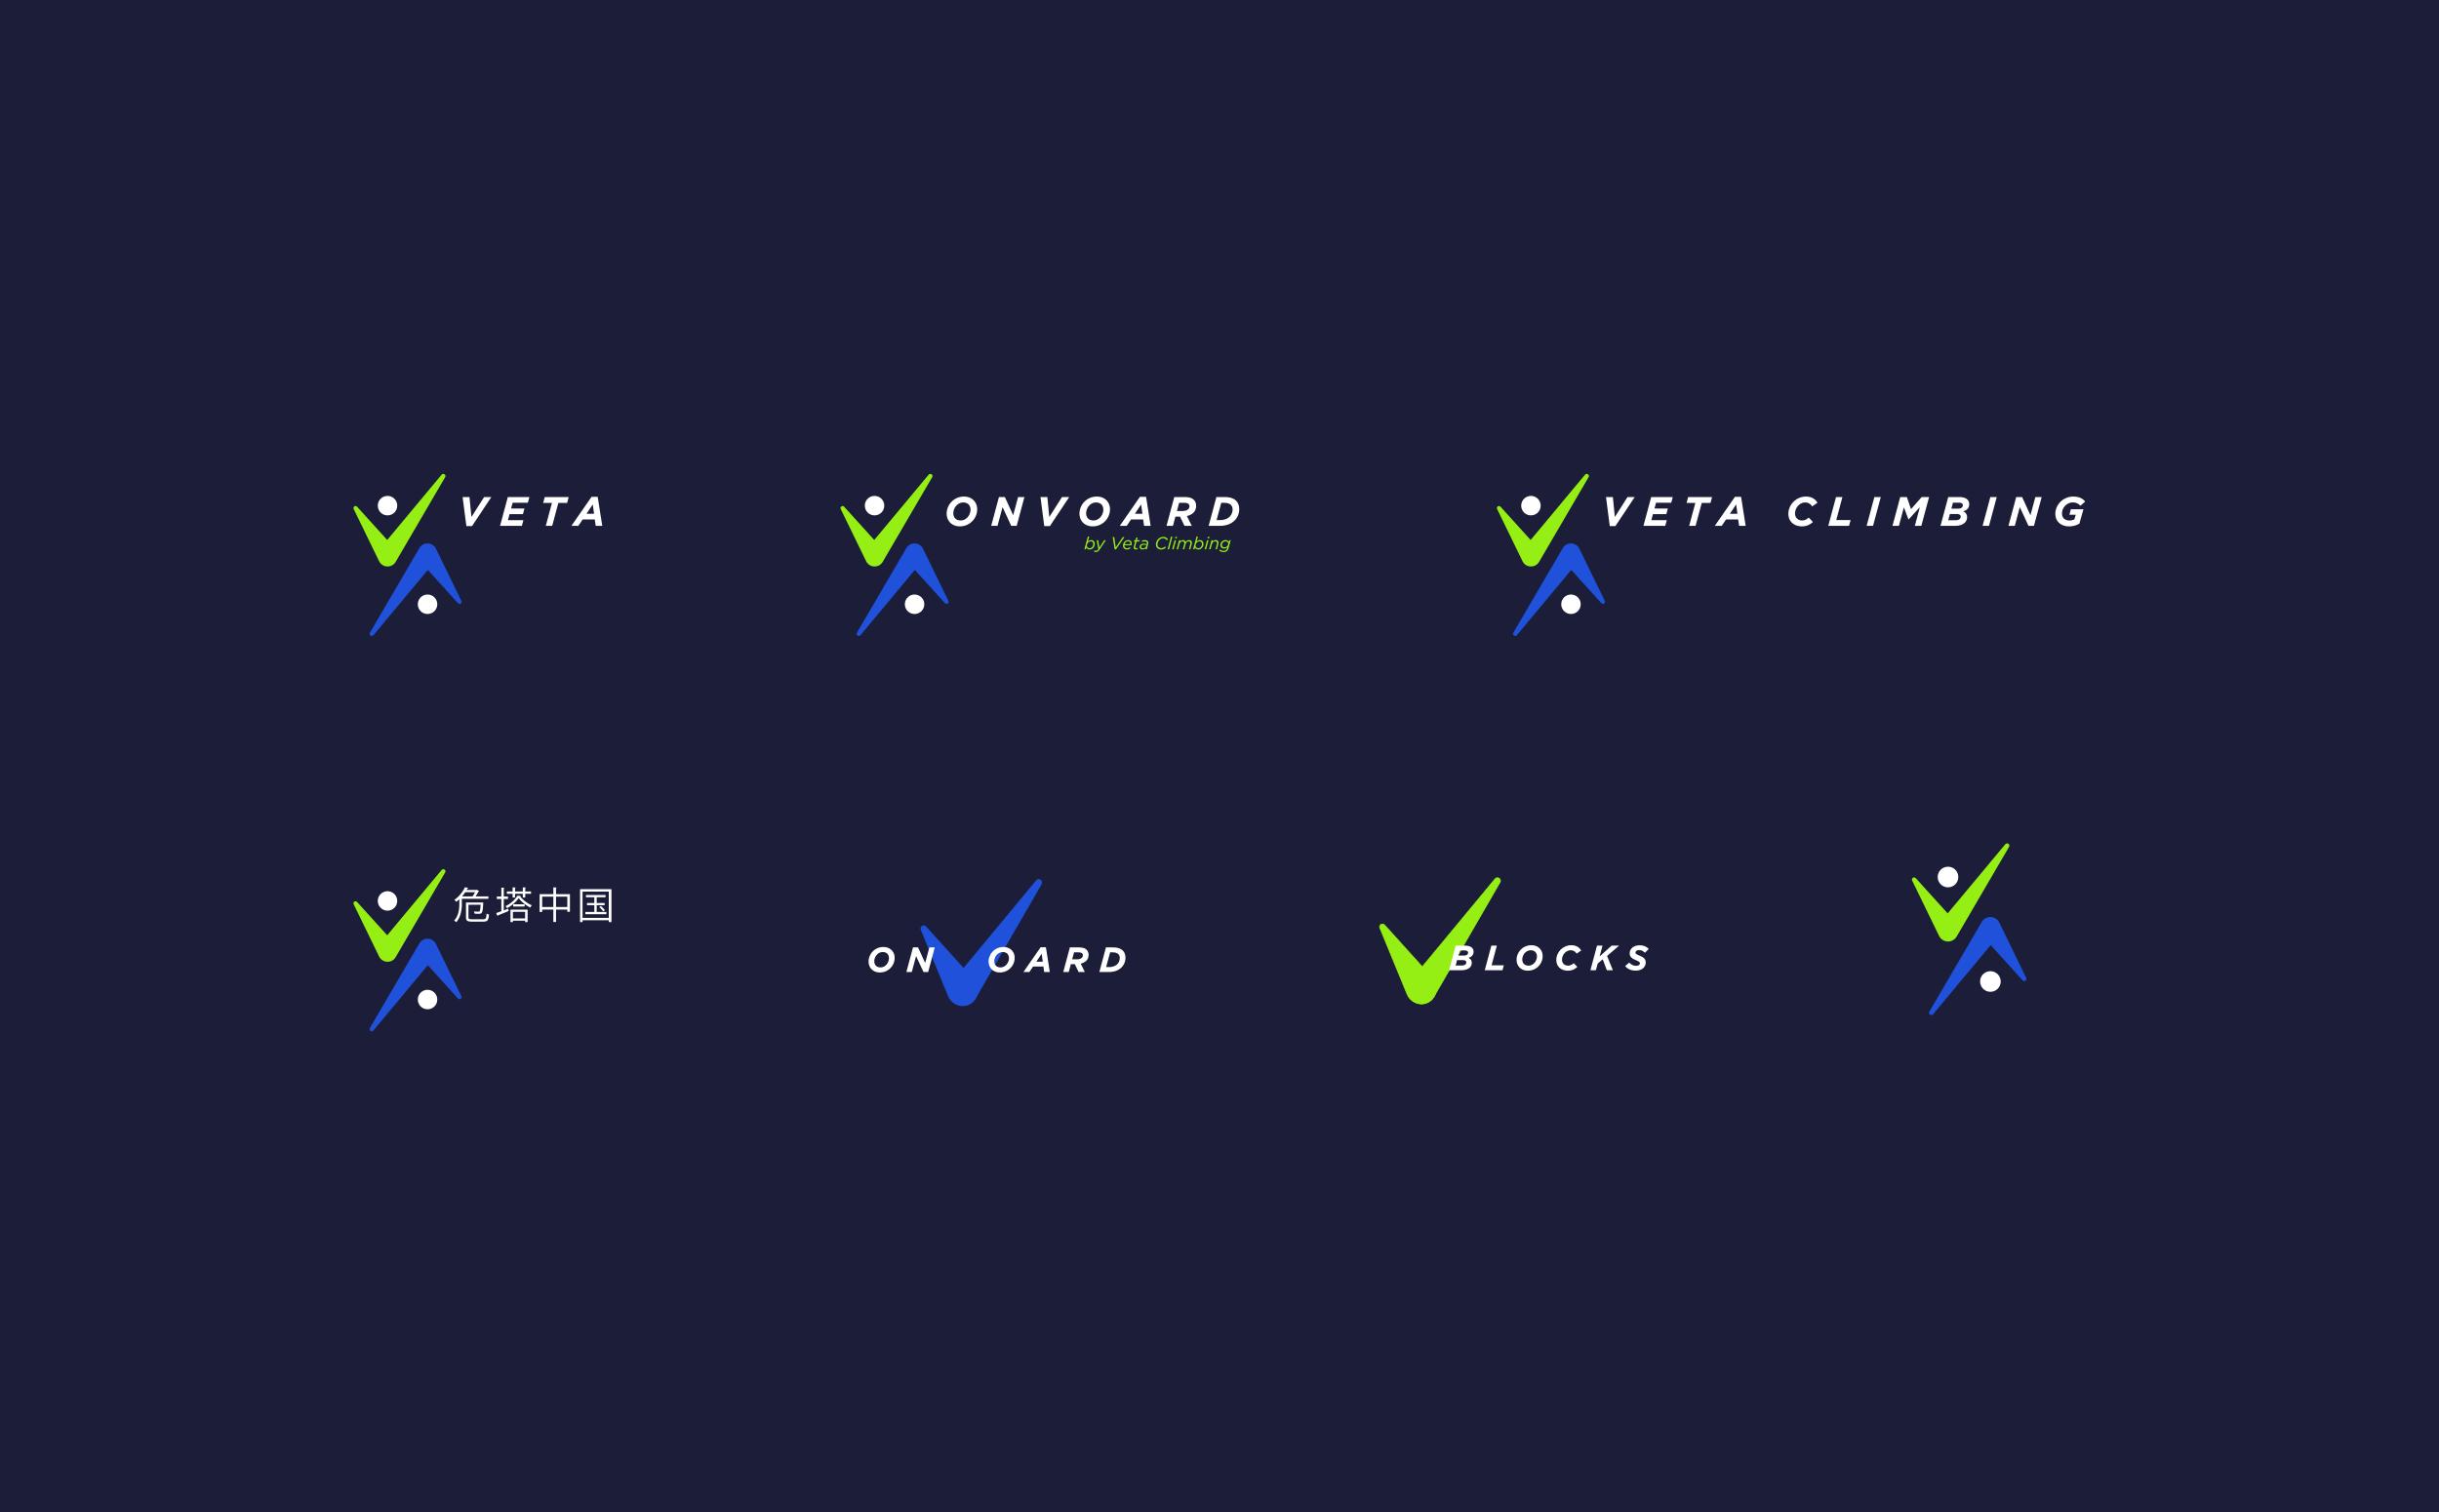 Veta-sublogos2